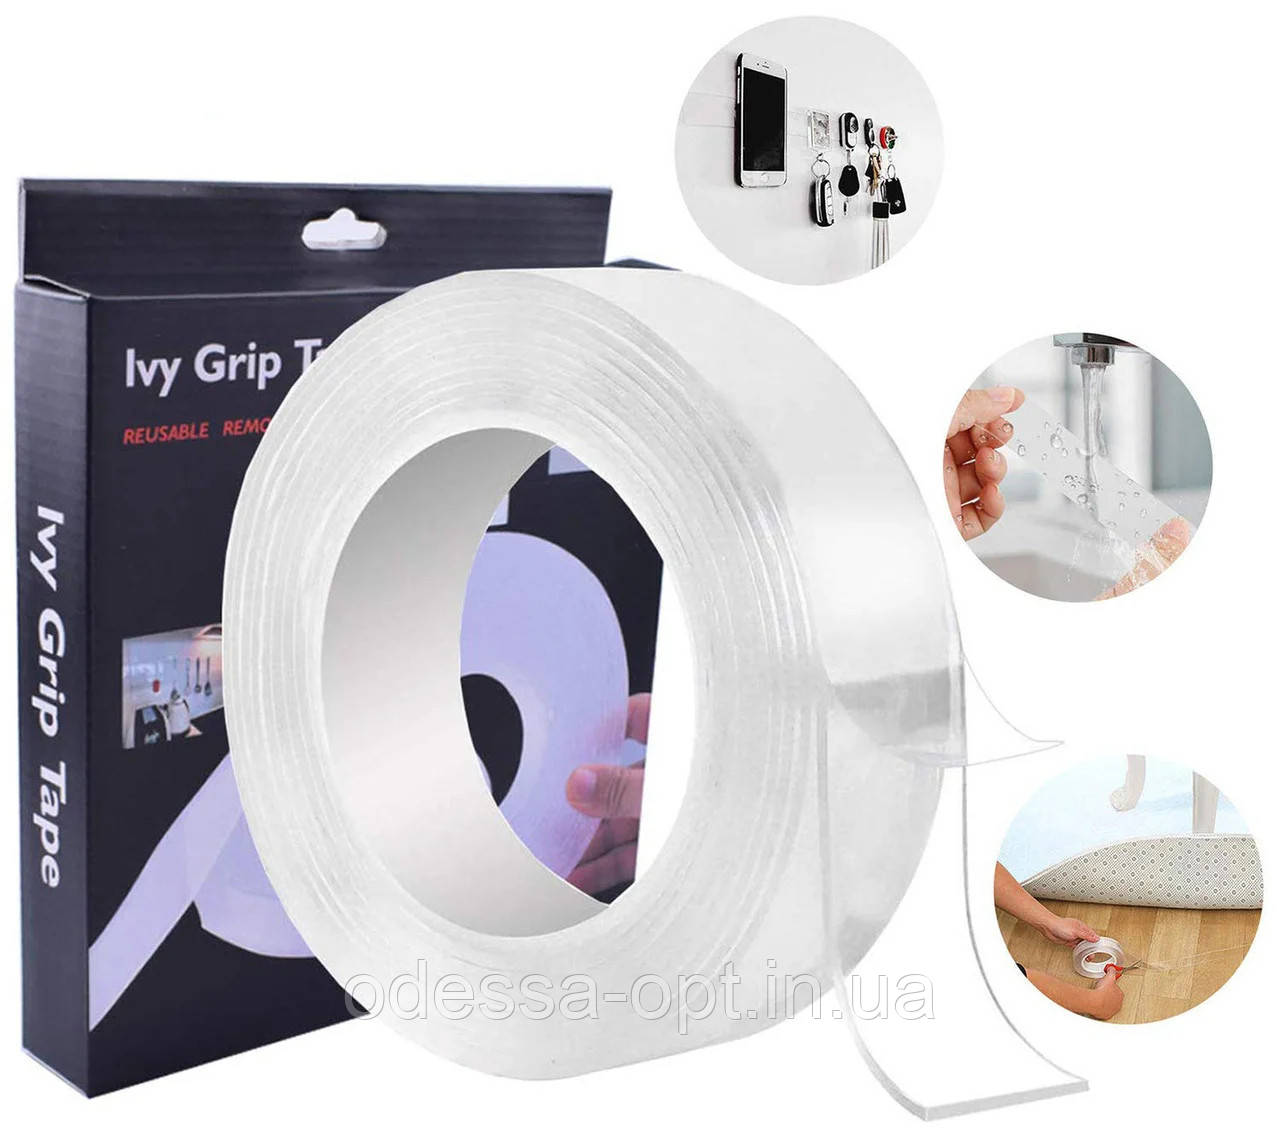 Ivy Grip Tape 1m (120)